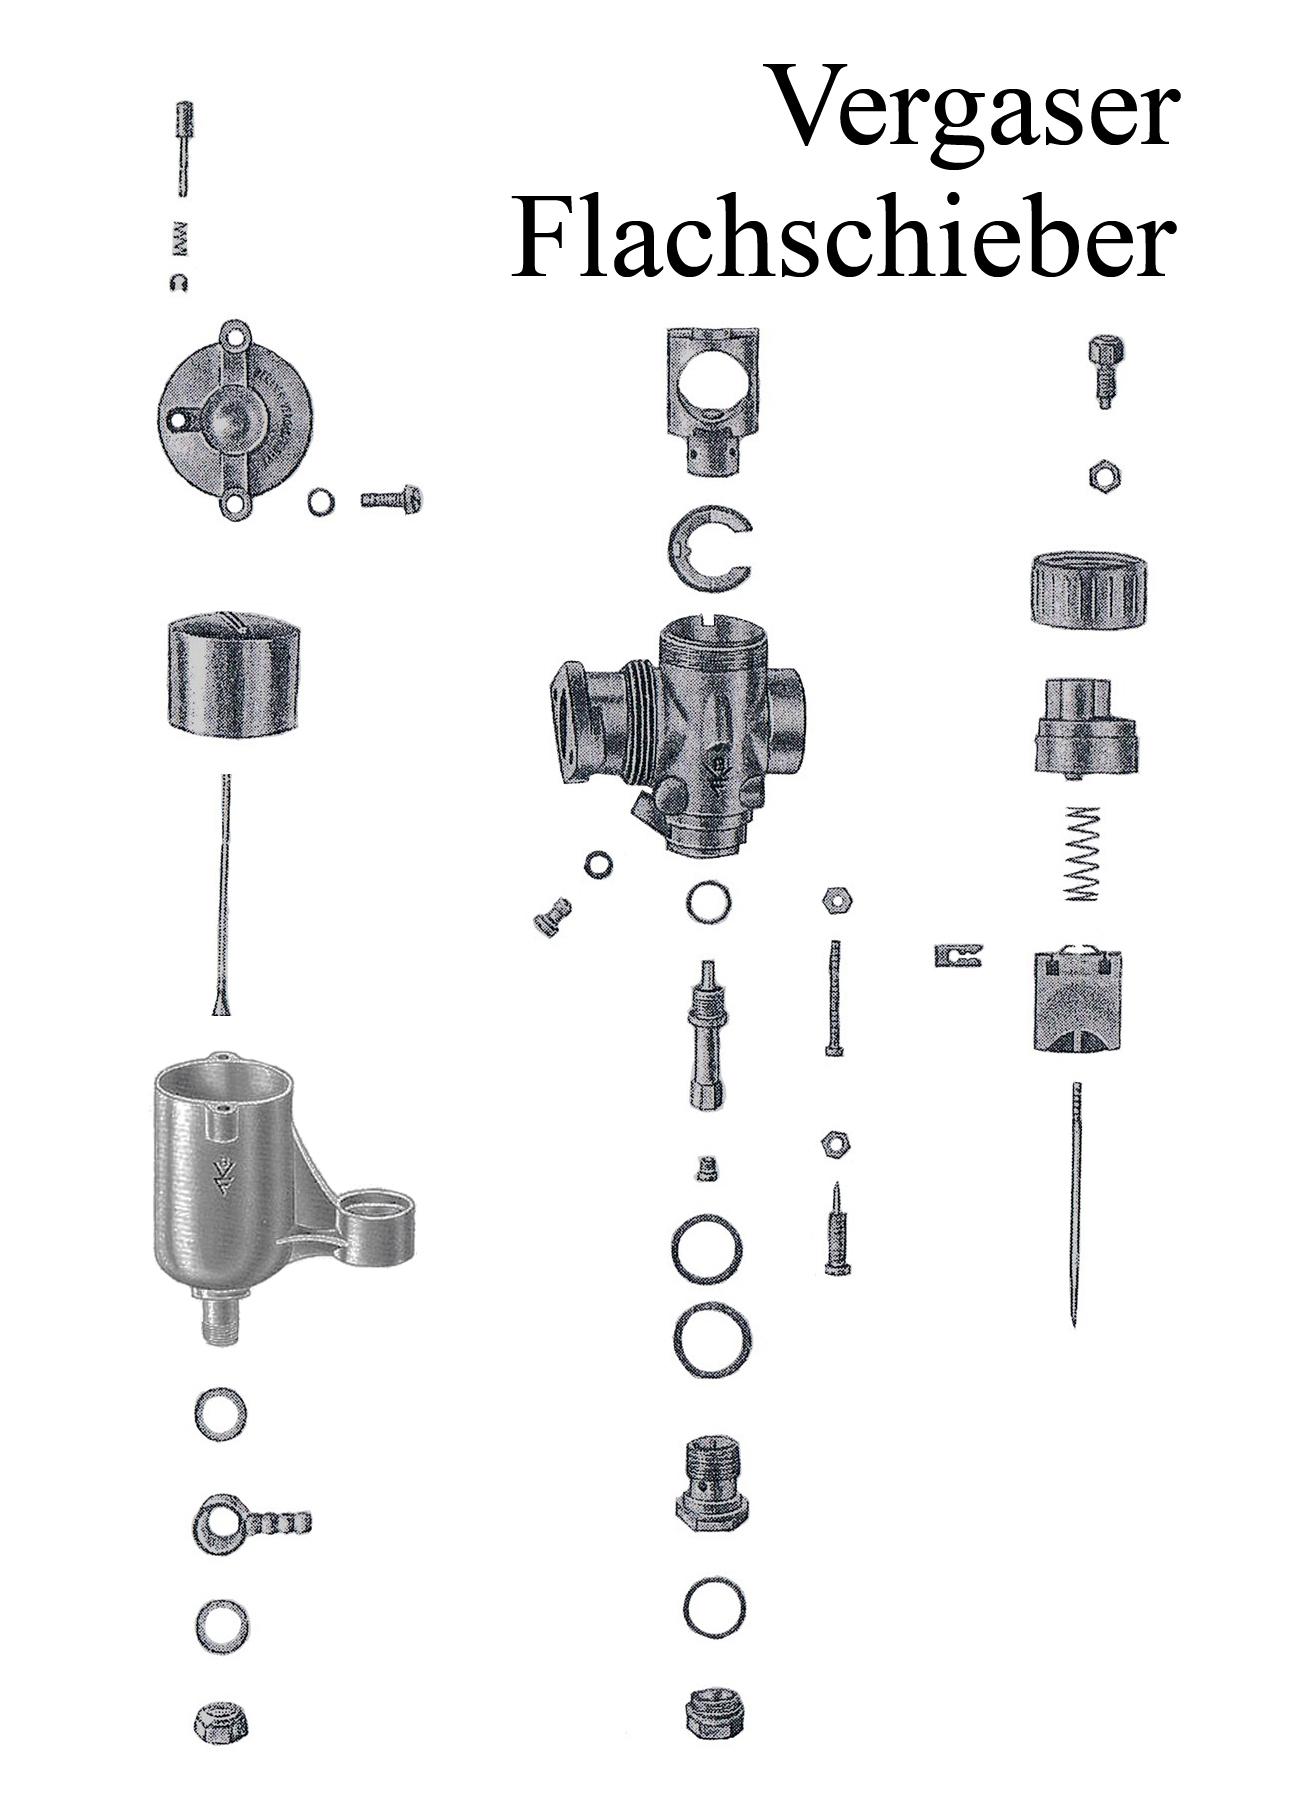 DDR-Motorrad AWO Touren Flachschiebervergaser 22N Düse Dichtung Schwimmer Nadelhalter Schieber Reparaturset